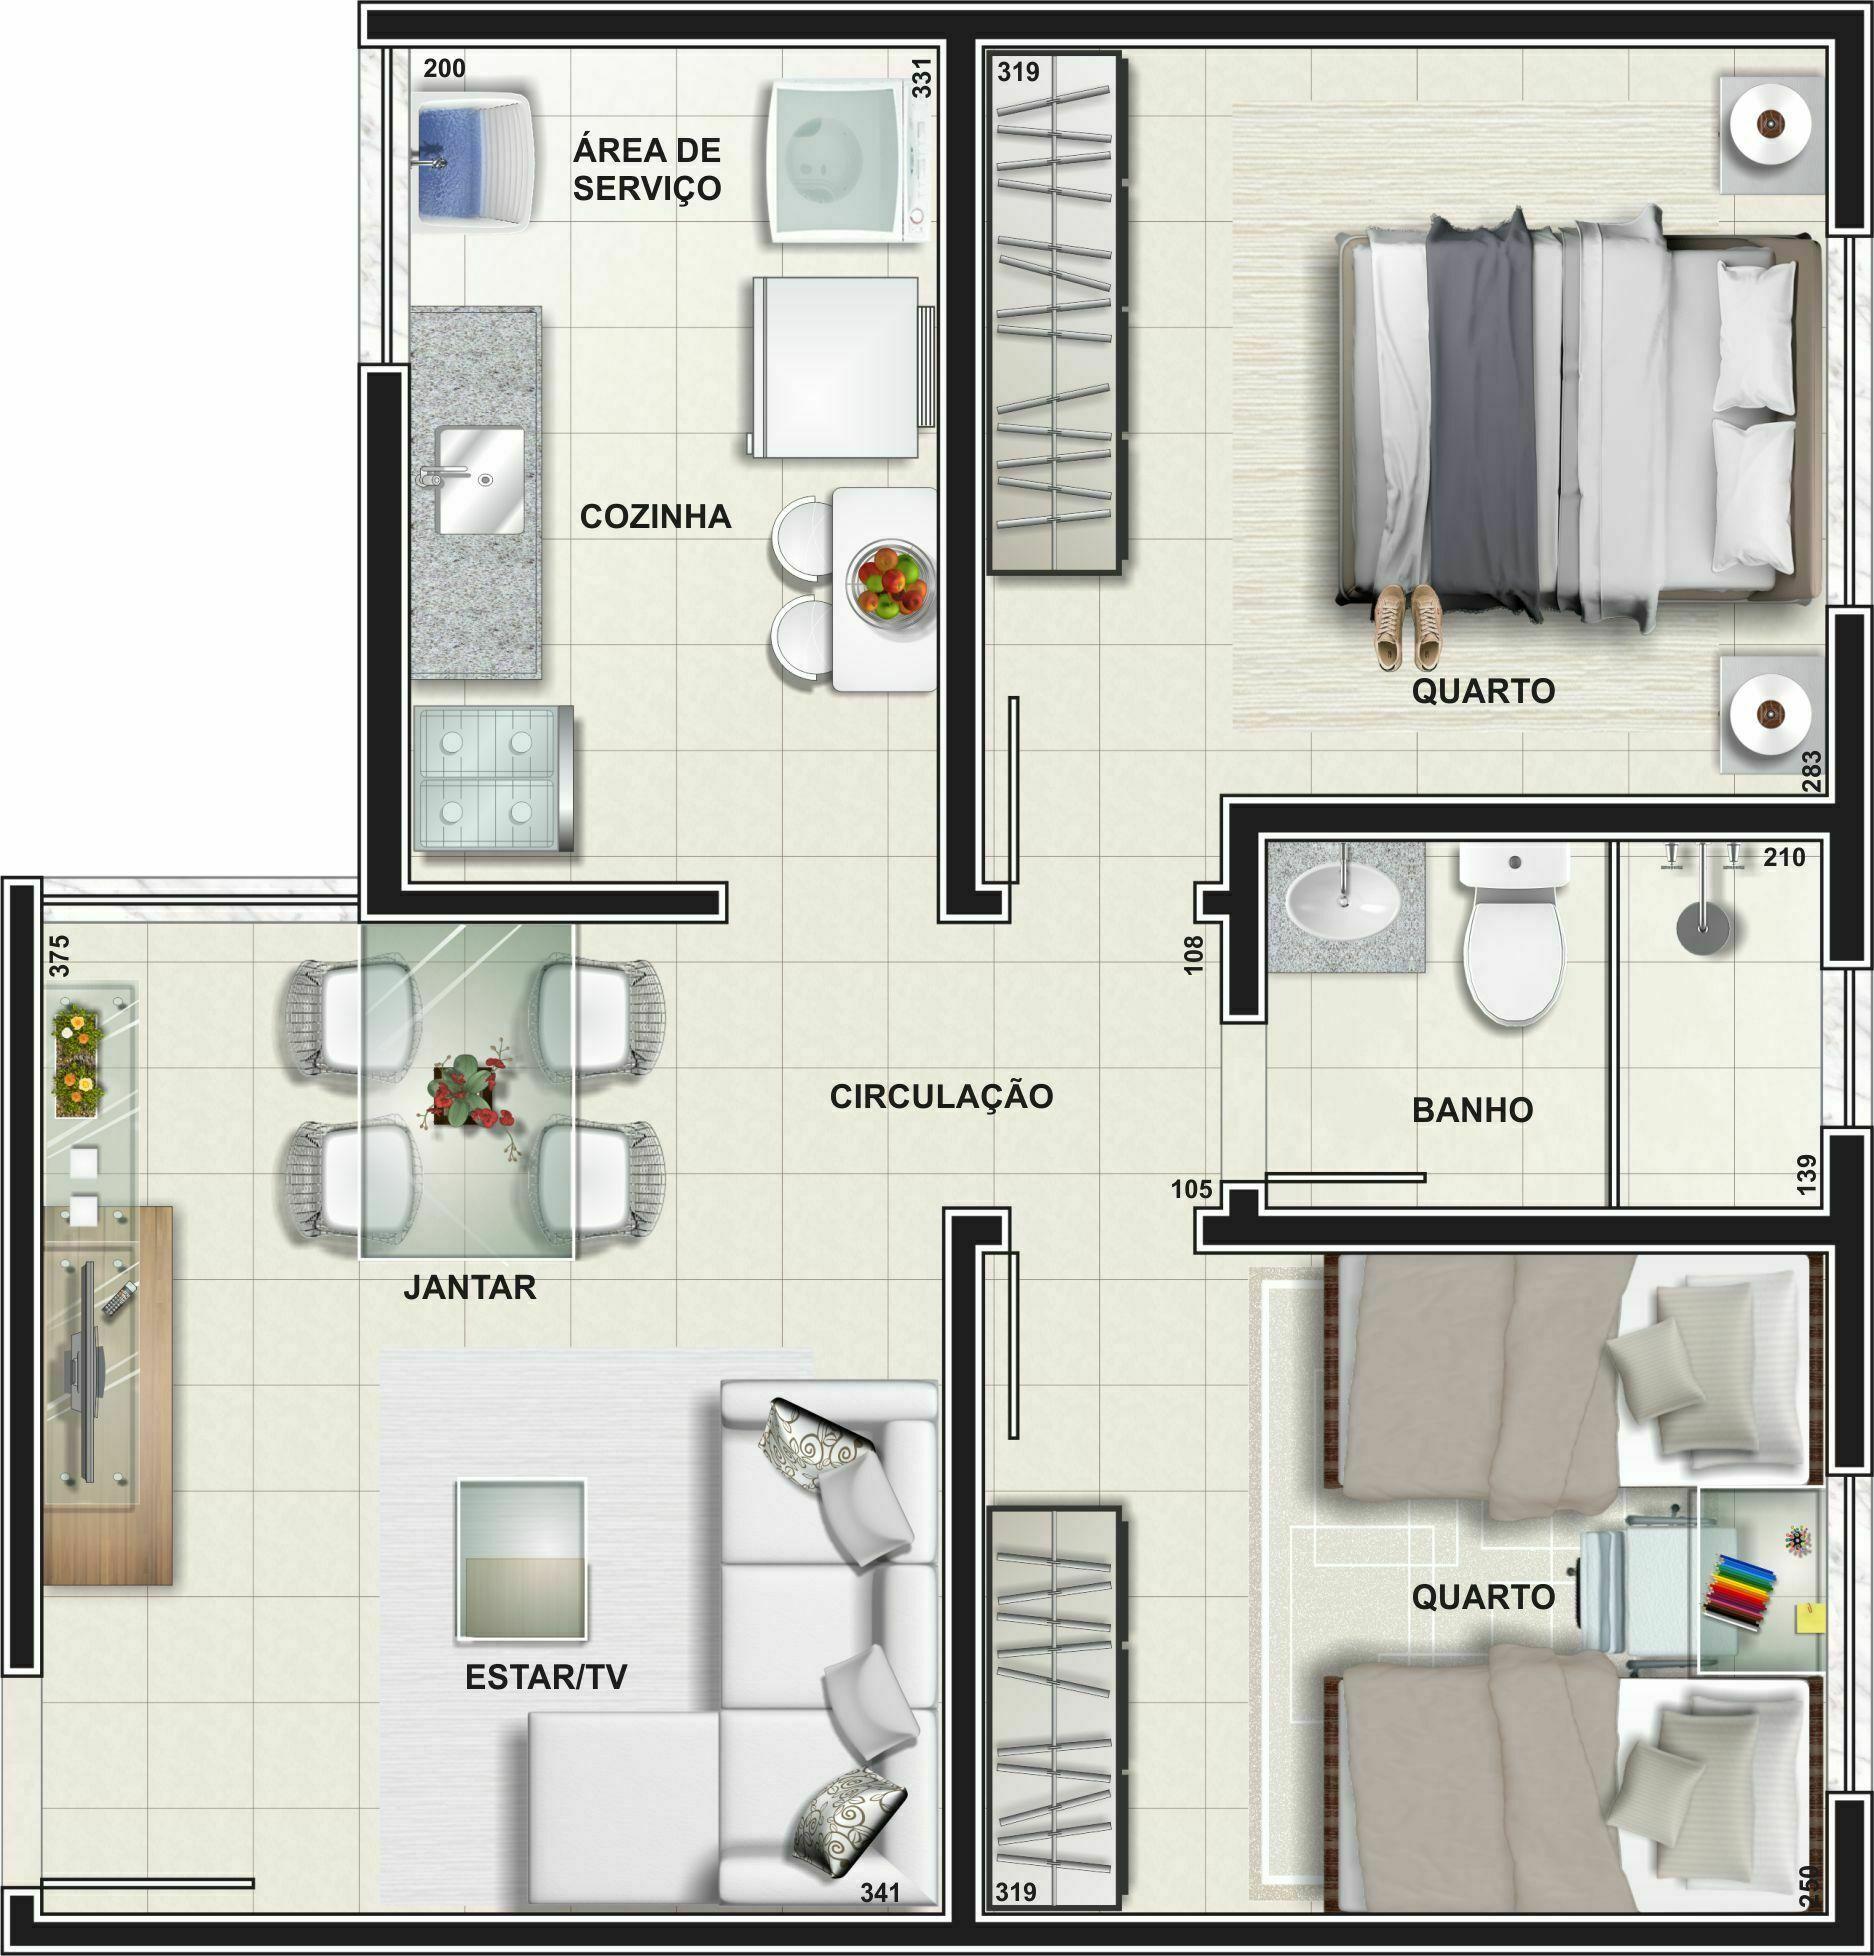 Planta Apartamento - Tipo 02 46.88 m²